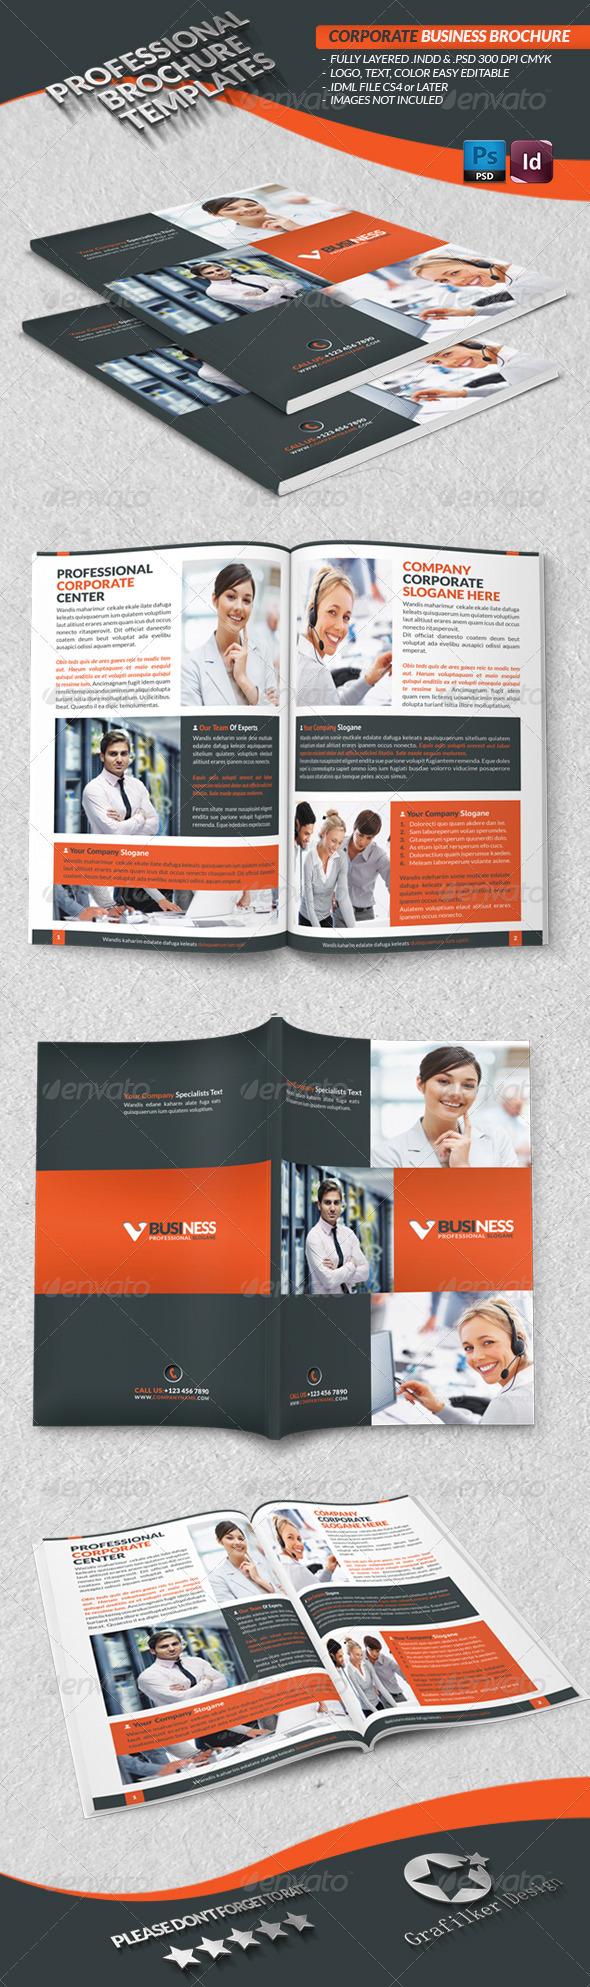 GraphicRiver Corporate Business Brochure 3771417